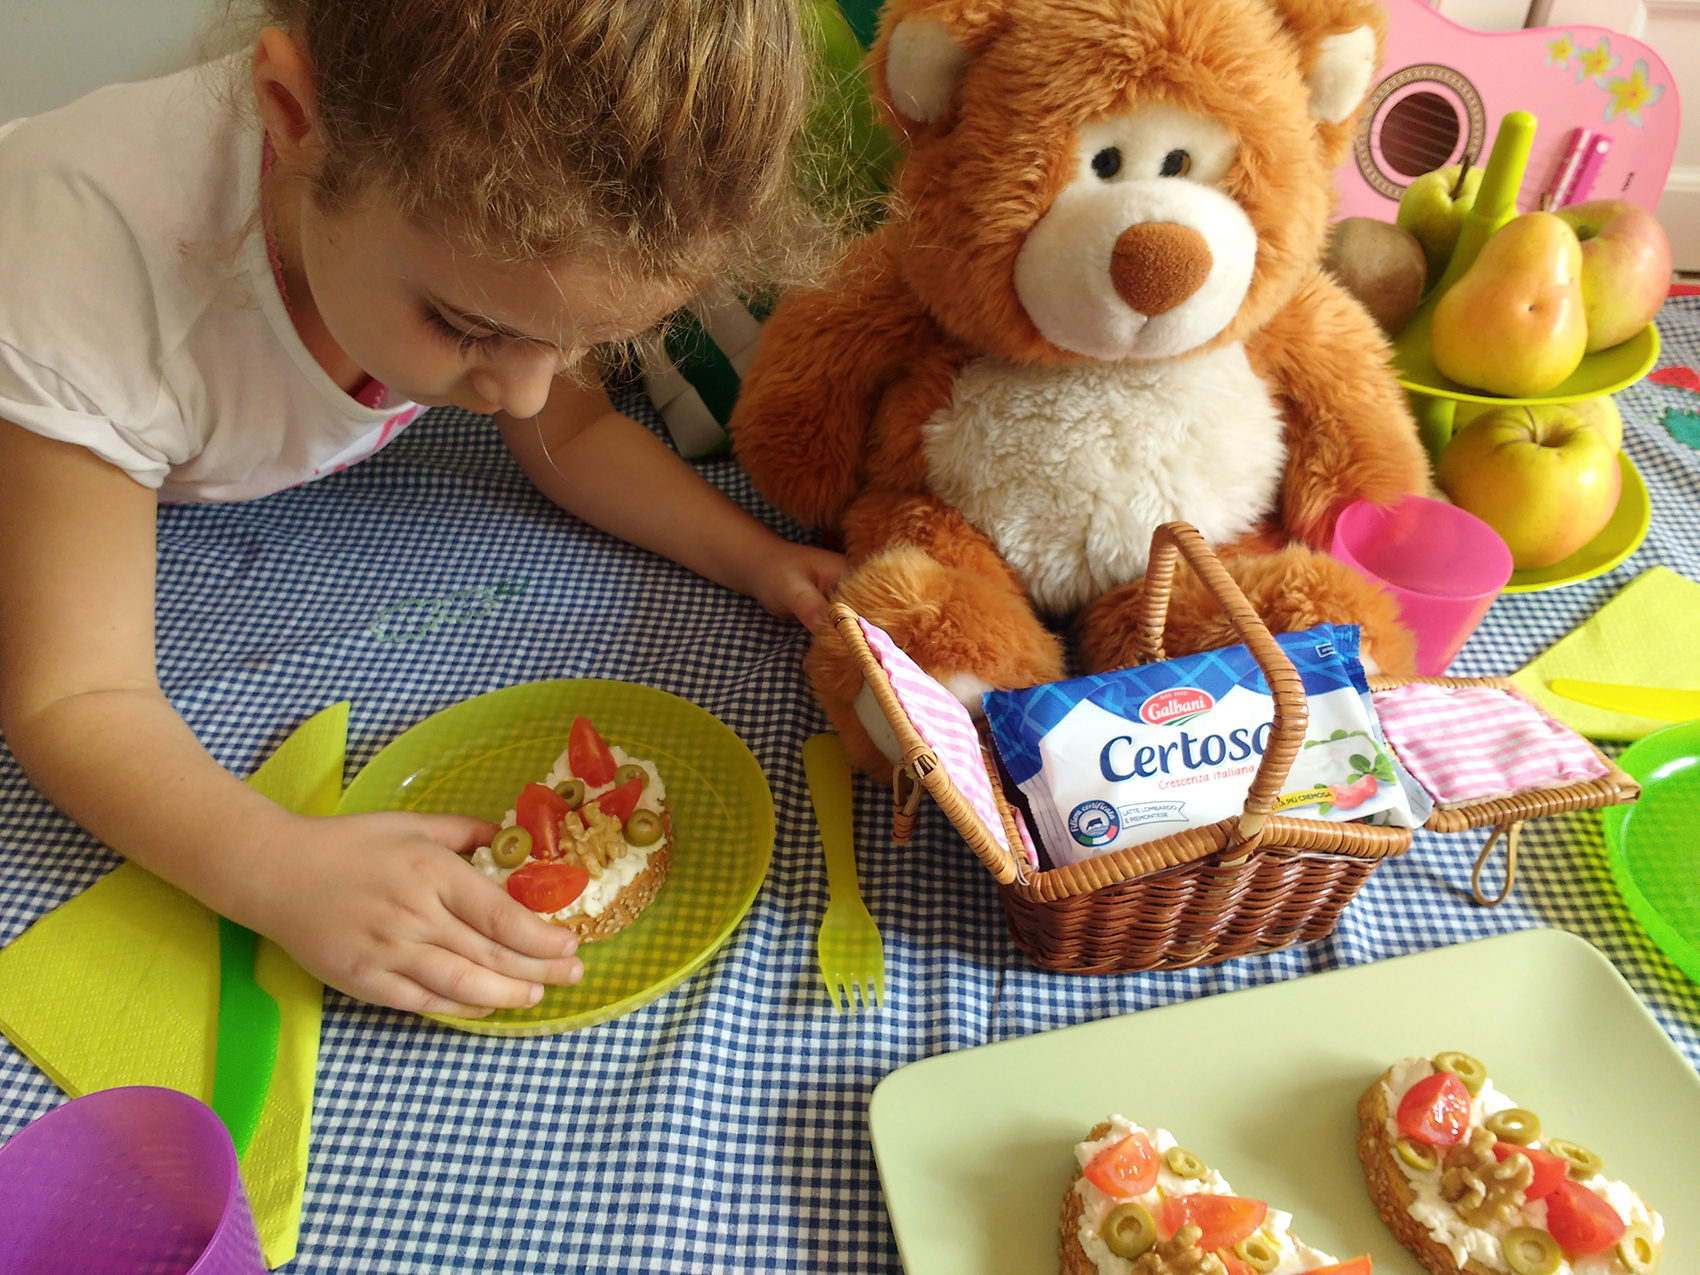 Merenda sana per i bambini con Certosa Galbani _ pic nic